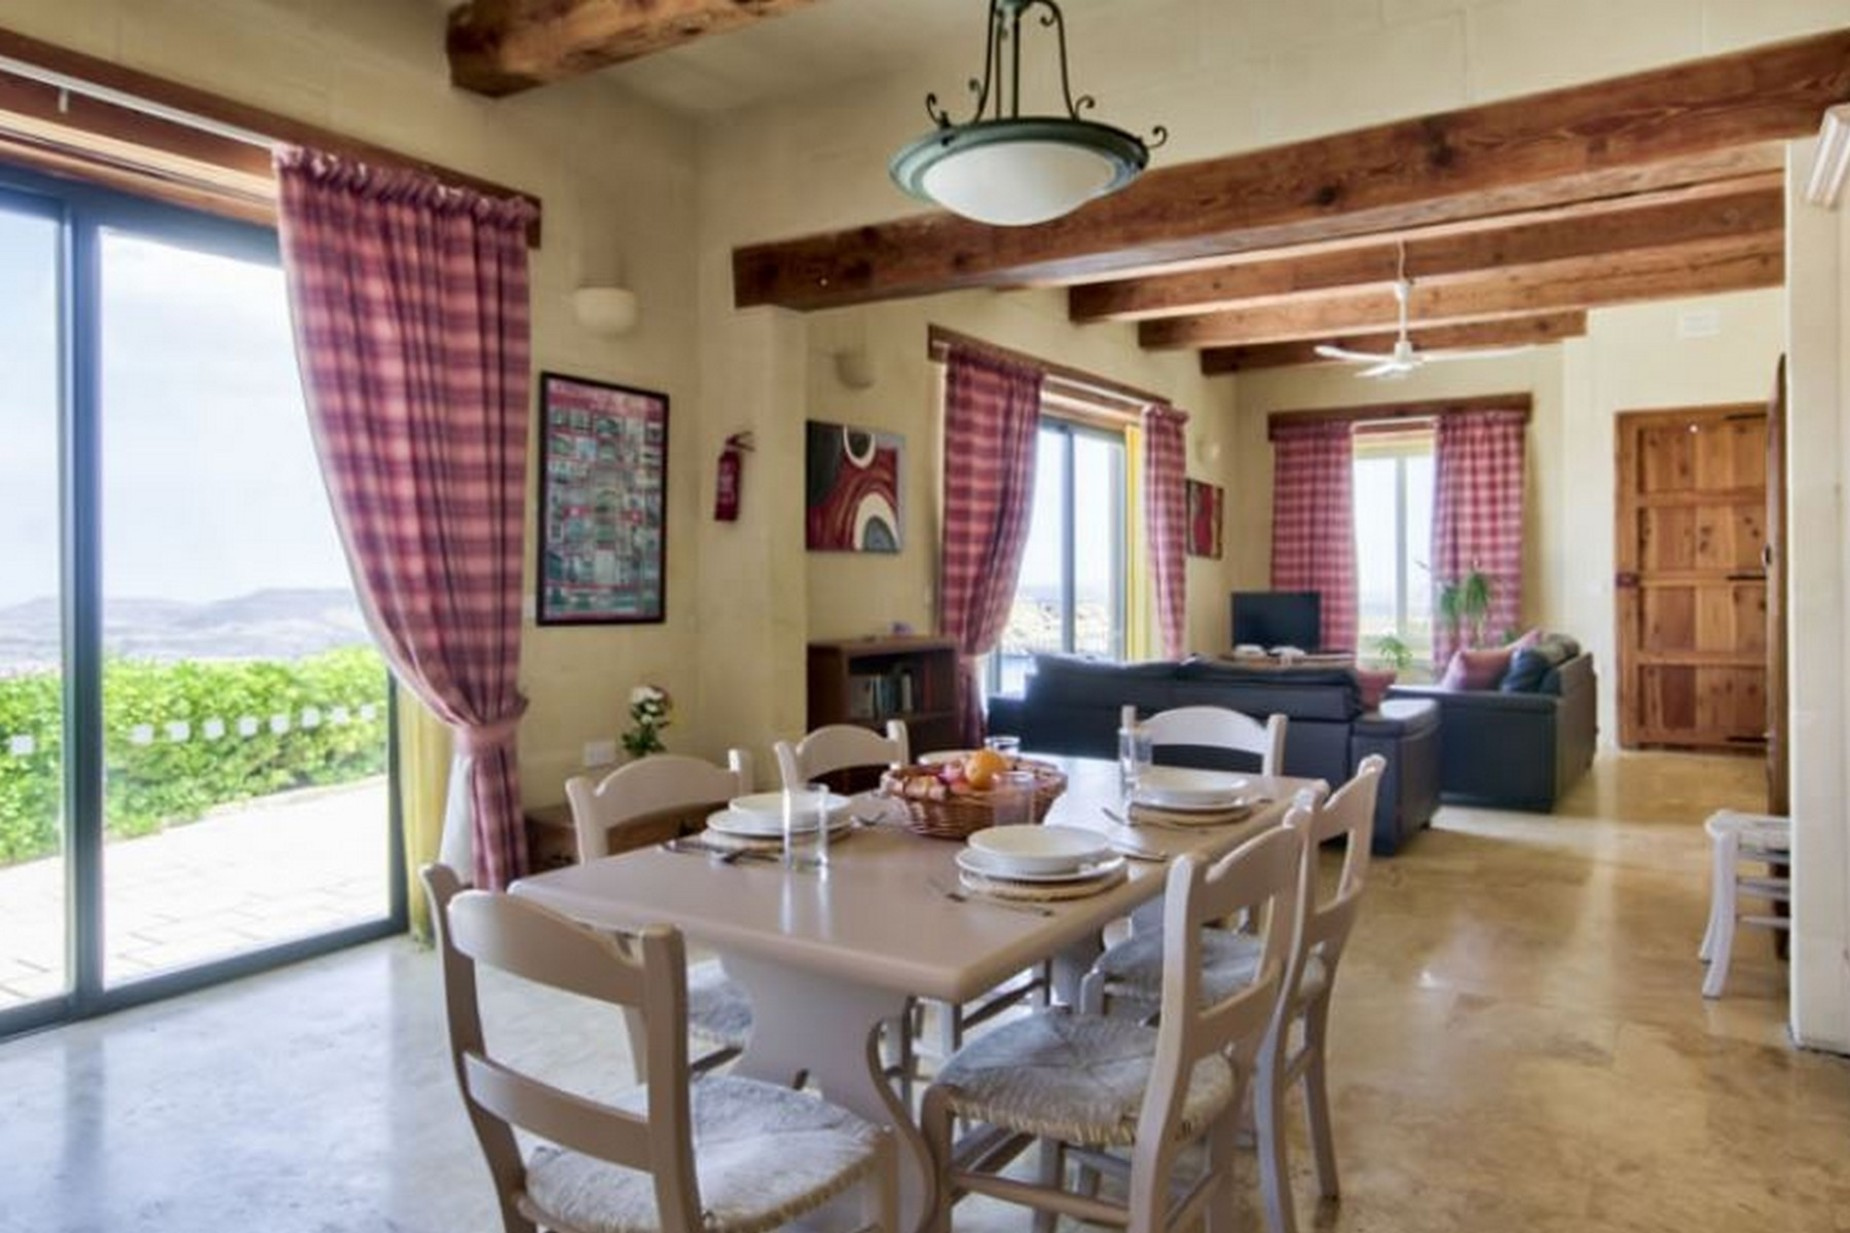 4 bed Farmhouse For Sale in Kercem, Kercem - thumb 6